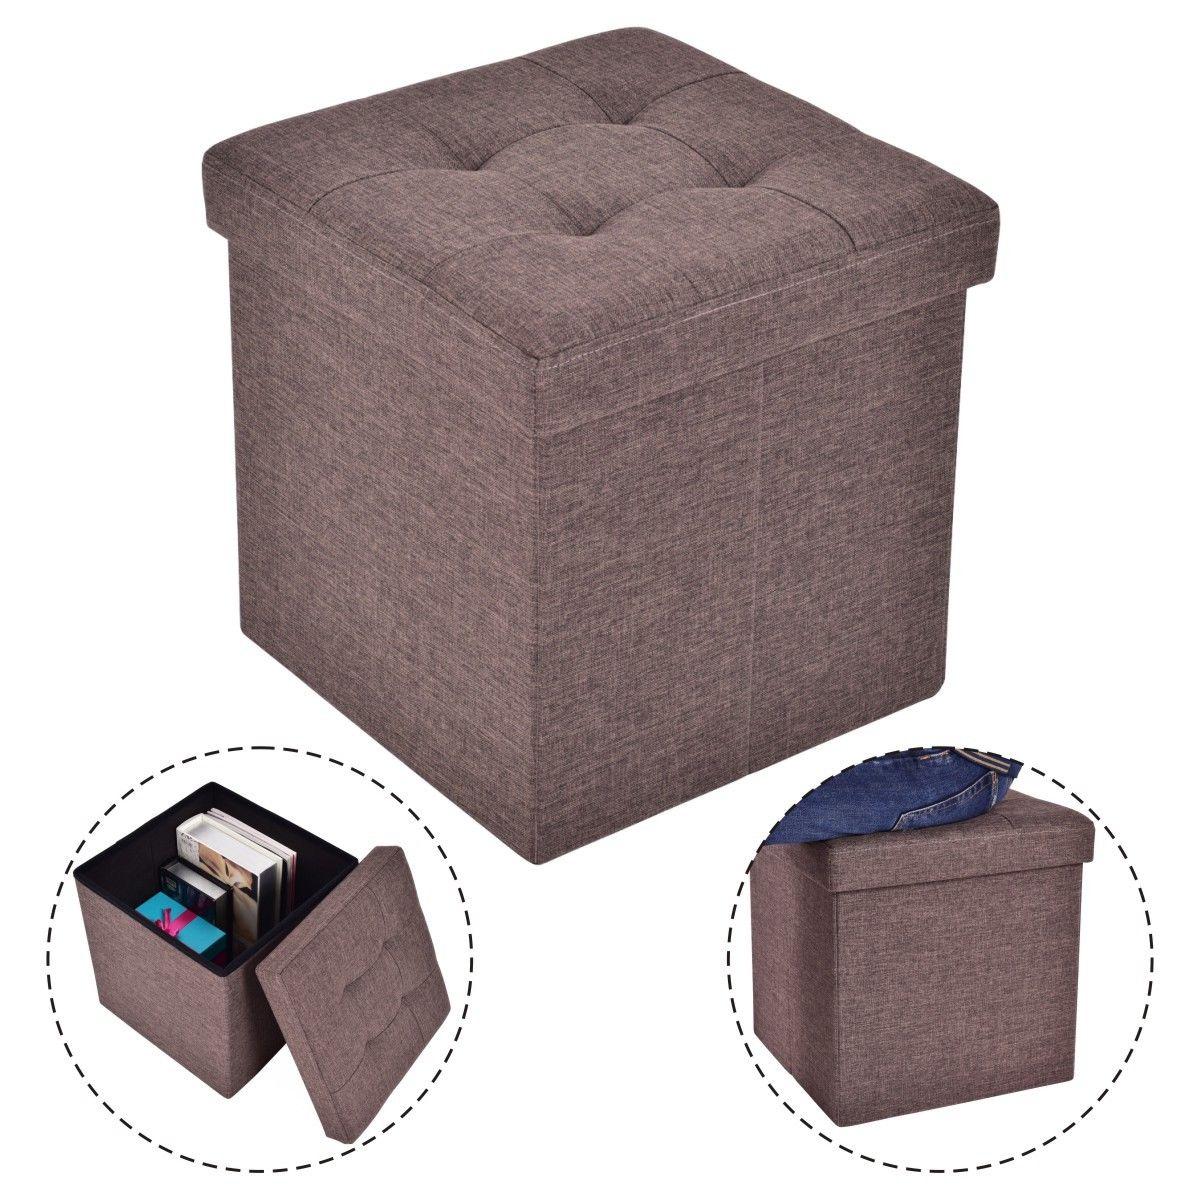 Costway Folding Storage Cube Ottoman Seat Stool Box Footrest Furniture Decor Brown